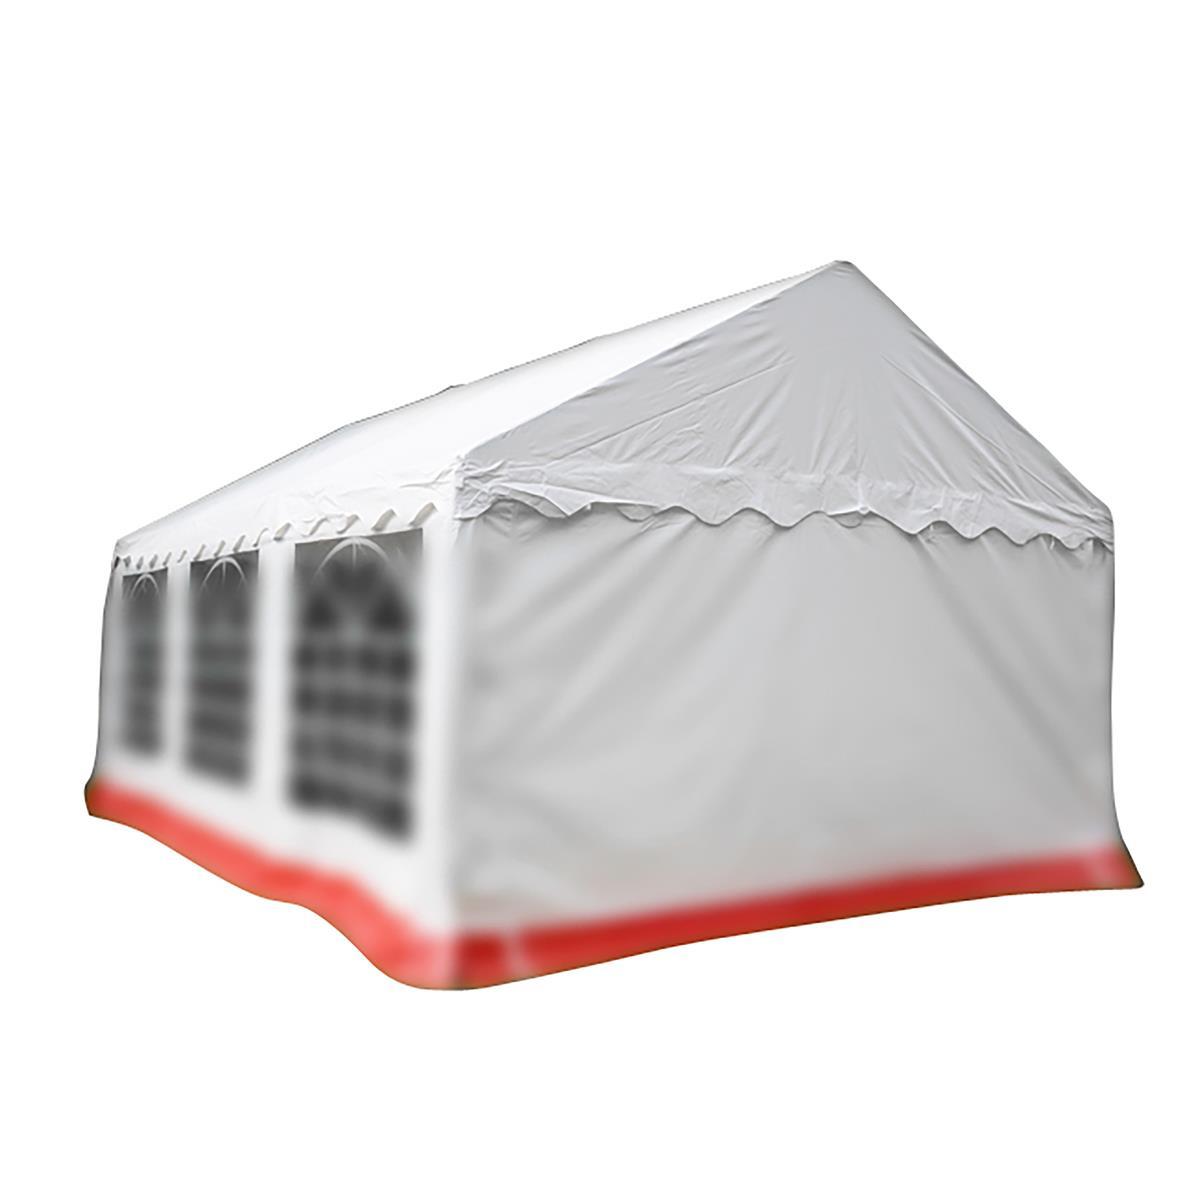 Ersatzdach Dachplane für Partyzelt Pavillon Zelt Festzelt PVC 4 x 6m weiß